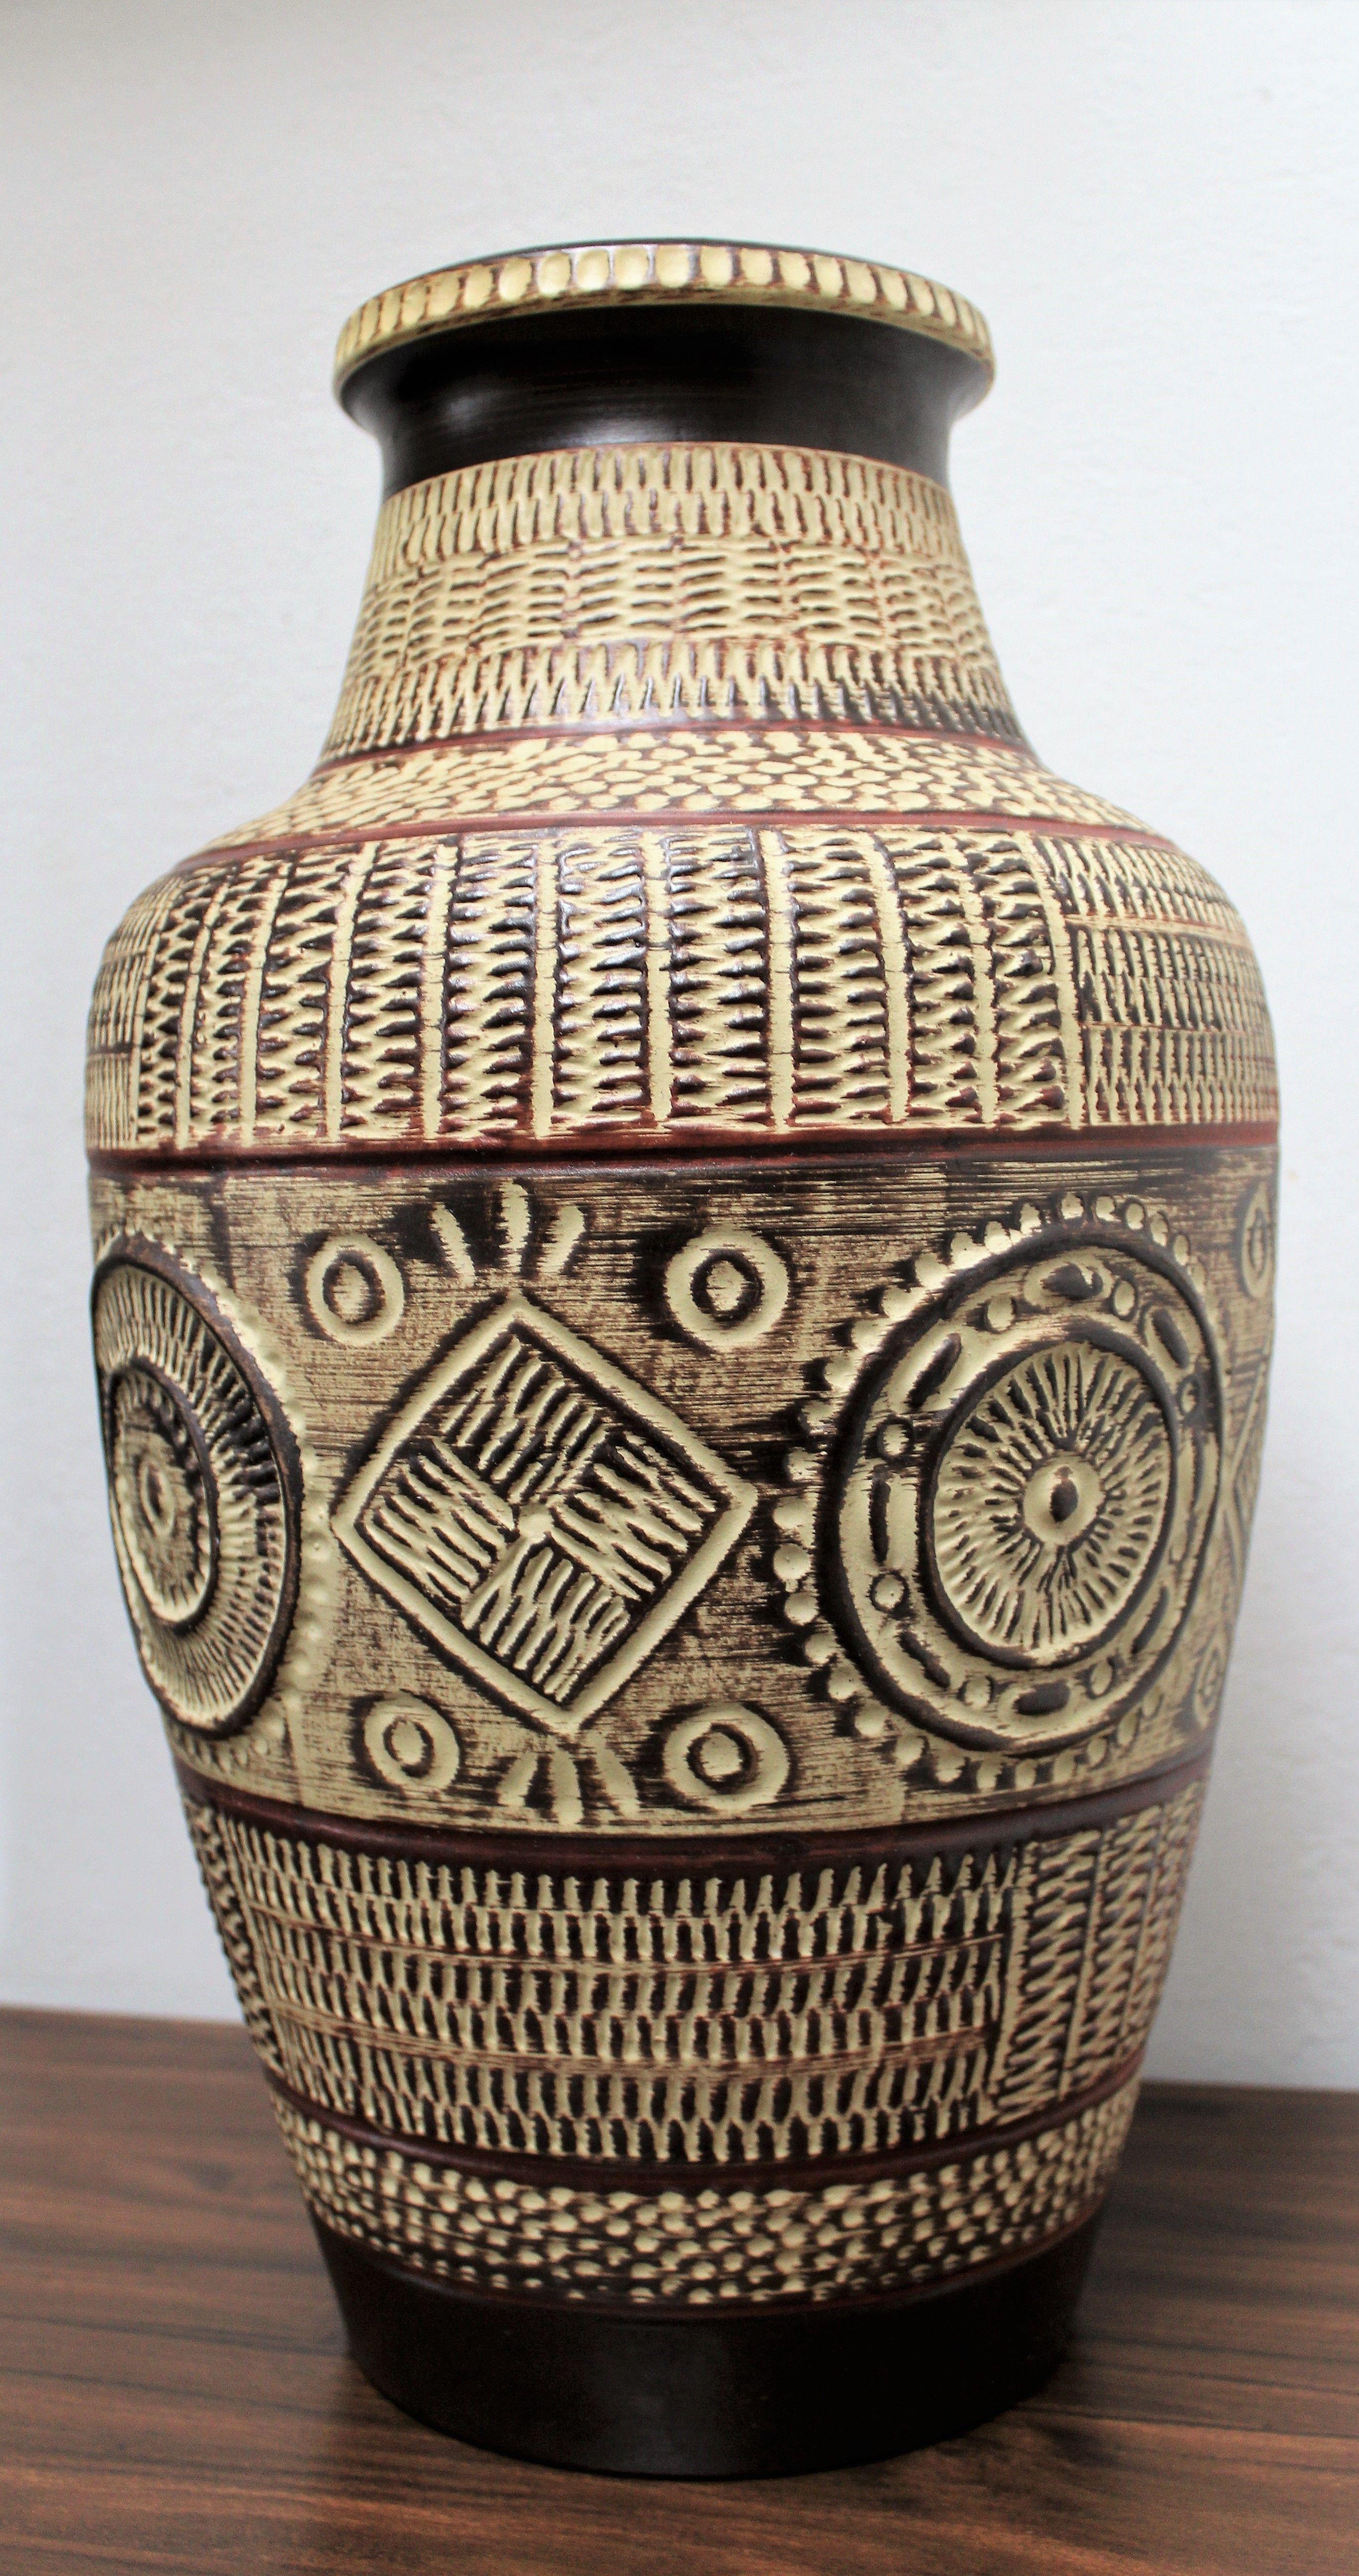 Vintage bay keramik floor vase model 550 45 matte glaze with ethic vintage bay keramik floor vase model 550 45 matte glaze with ethic dcor west reviewsmspy